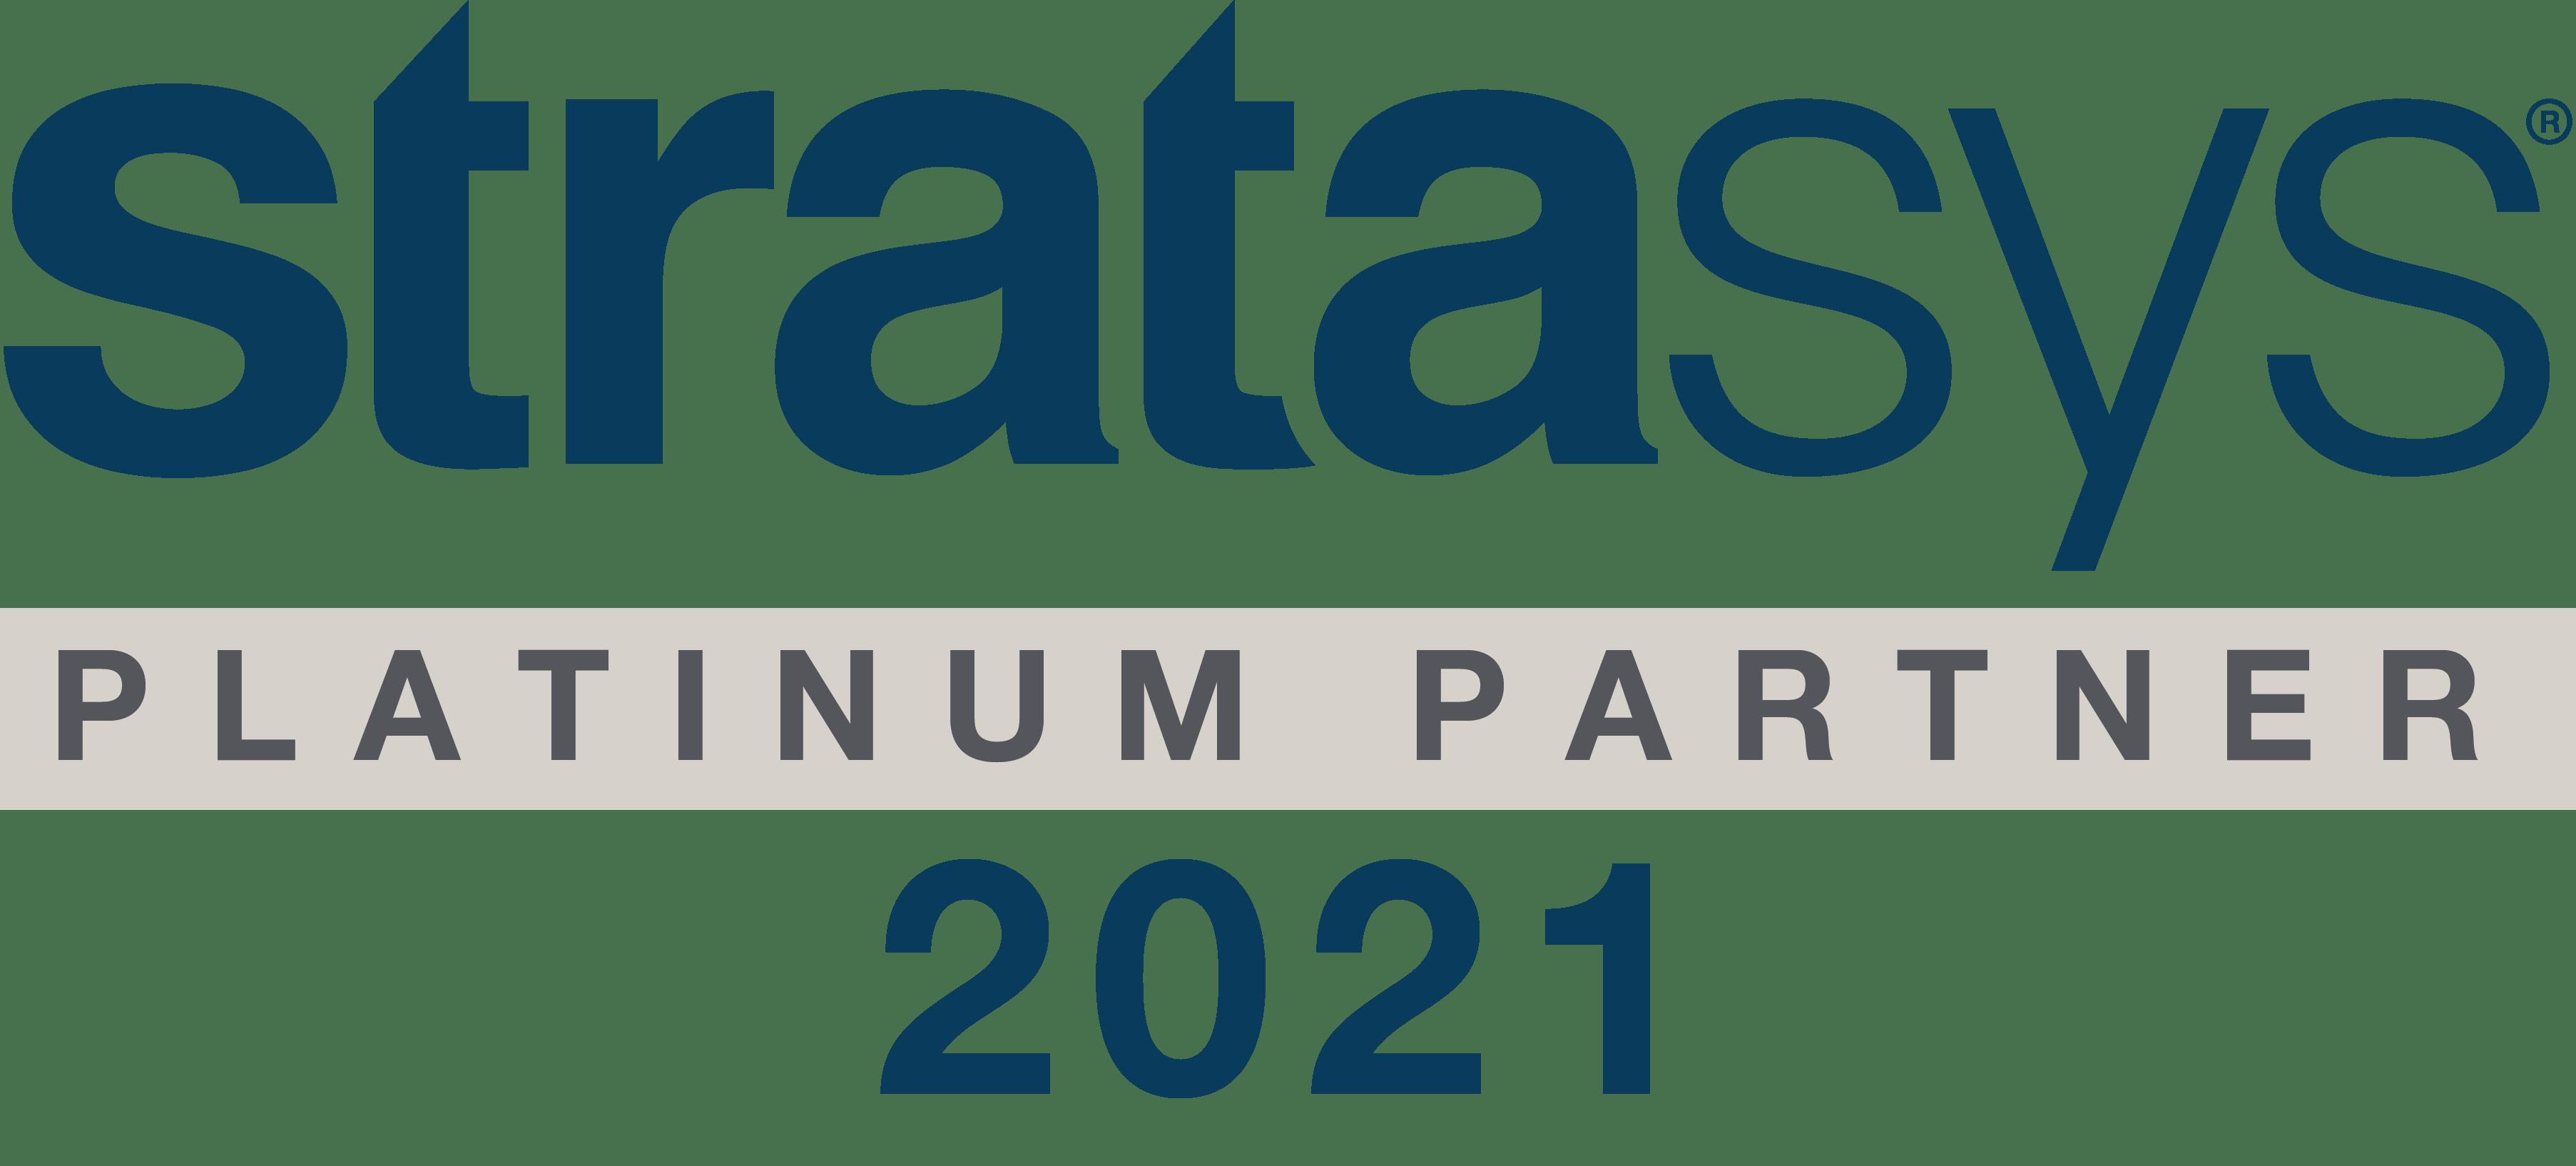 Platinum Partner - Stratasys Logo 2021 PNG